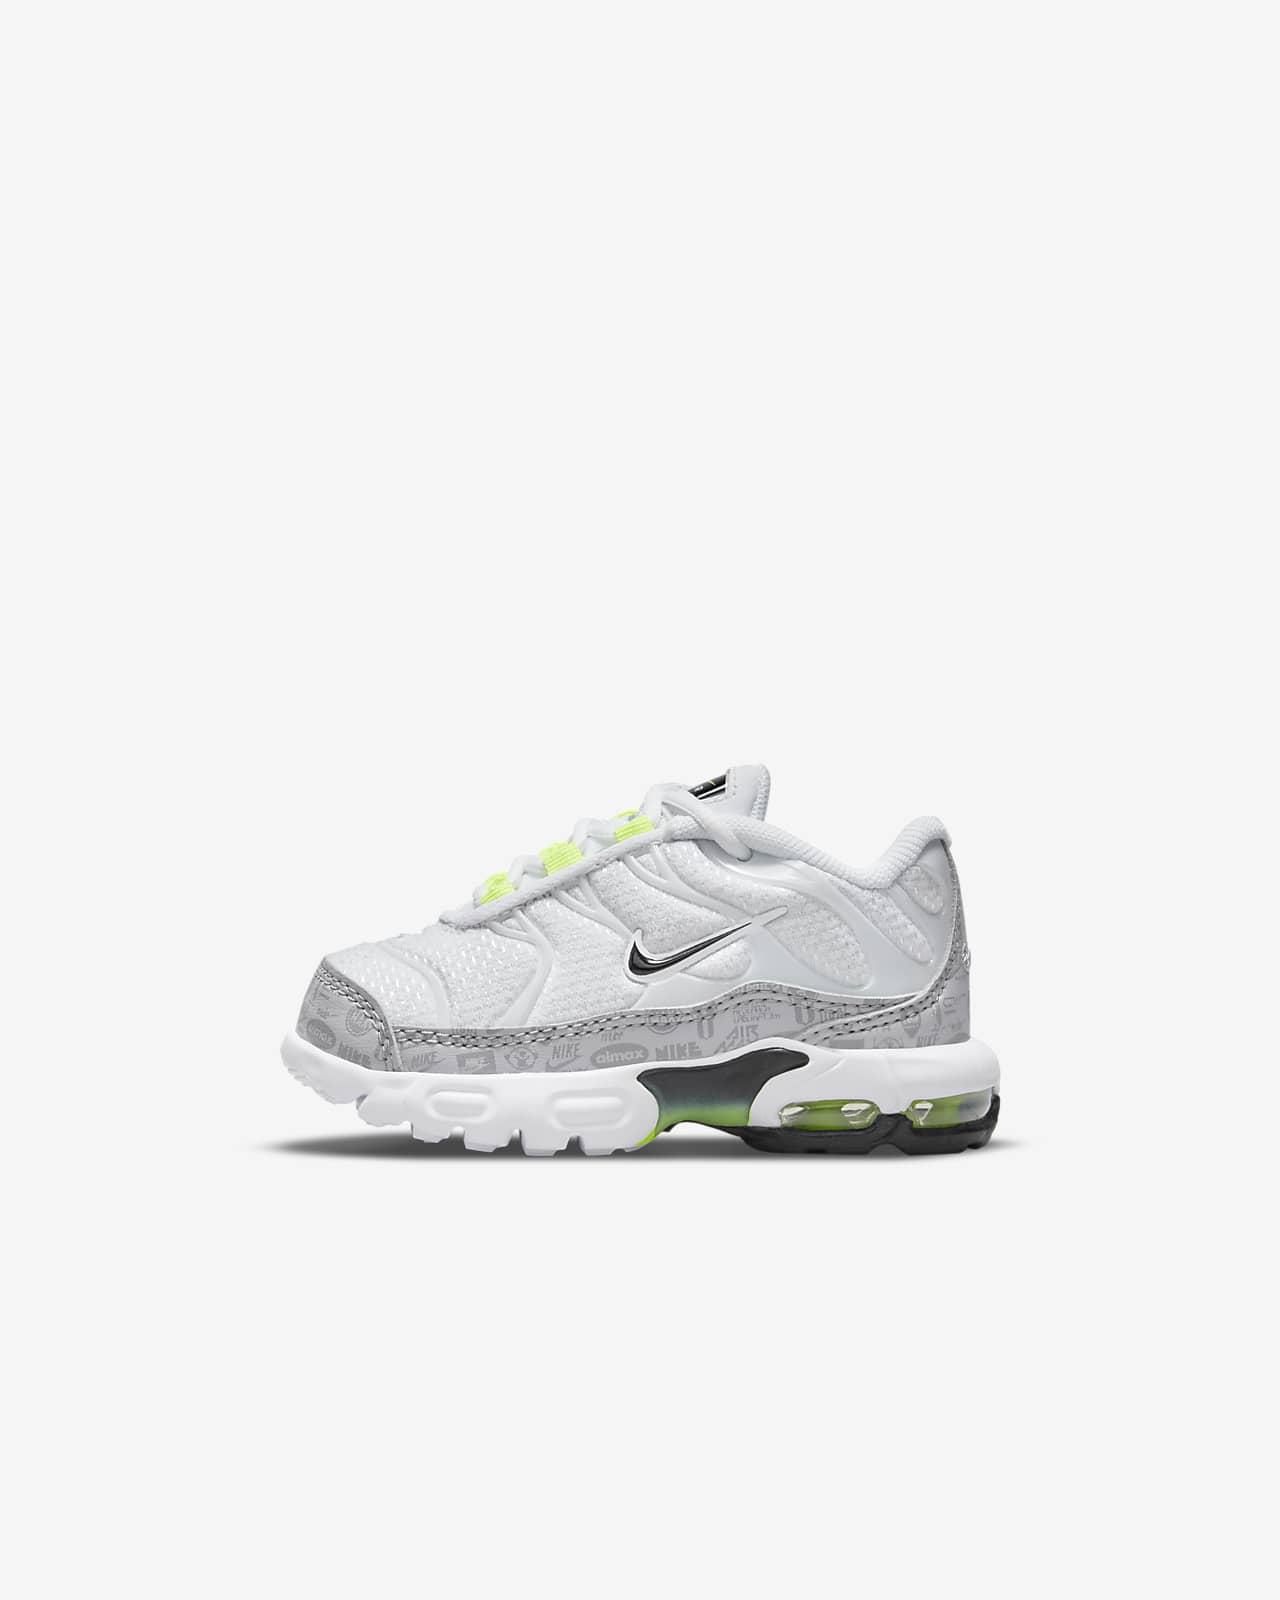 Nike Air Max Plus sko til sped-/småbarn